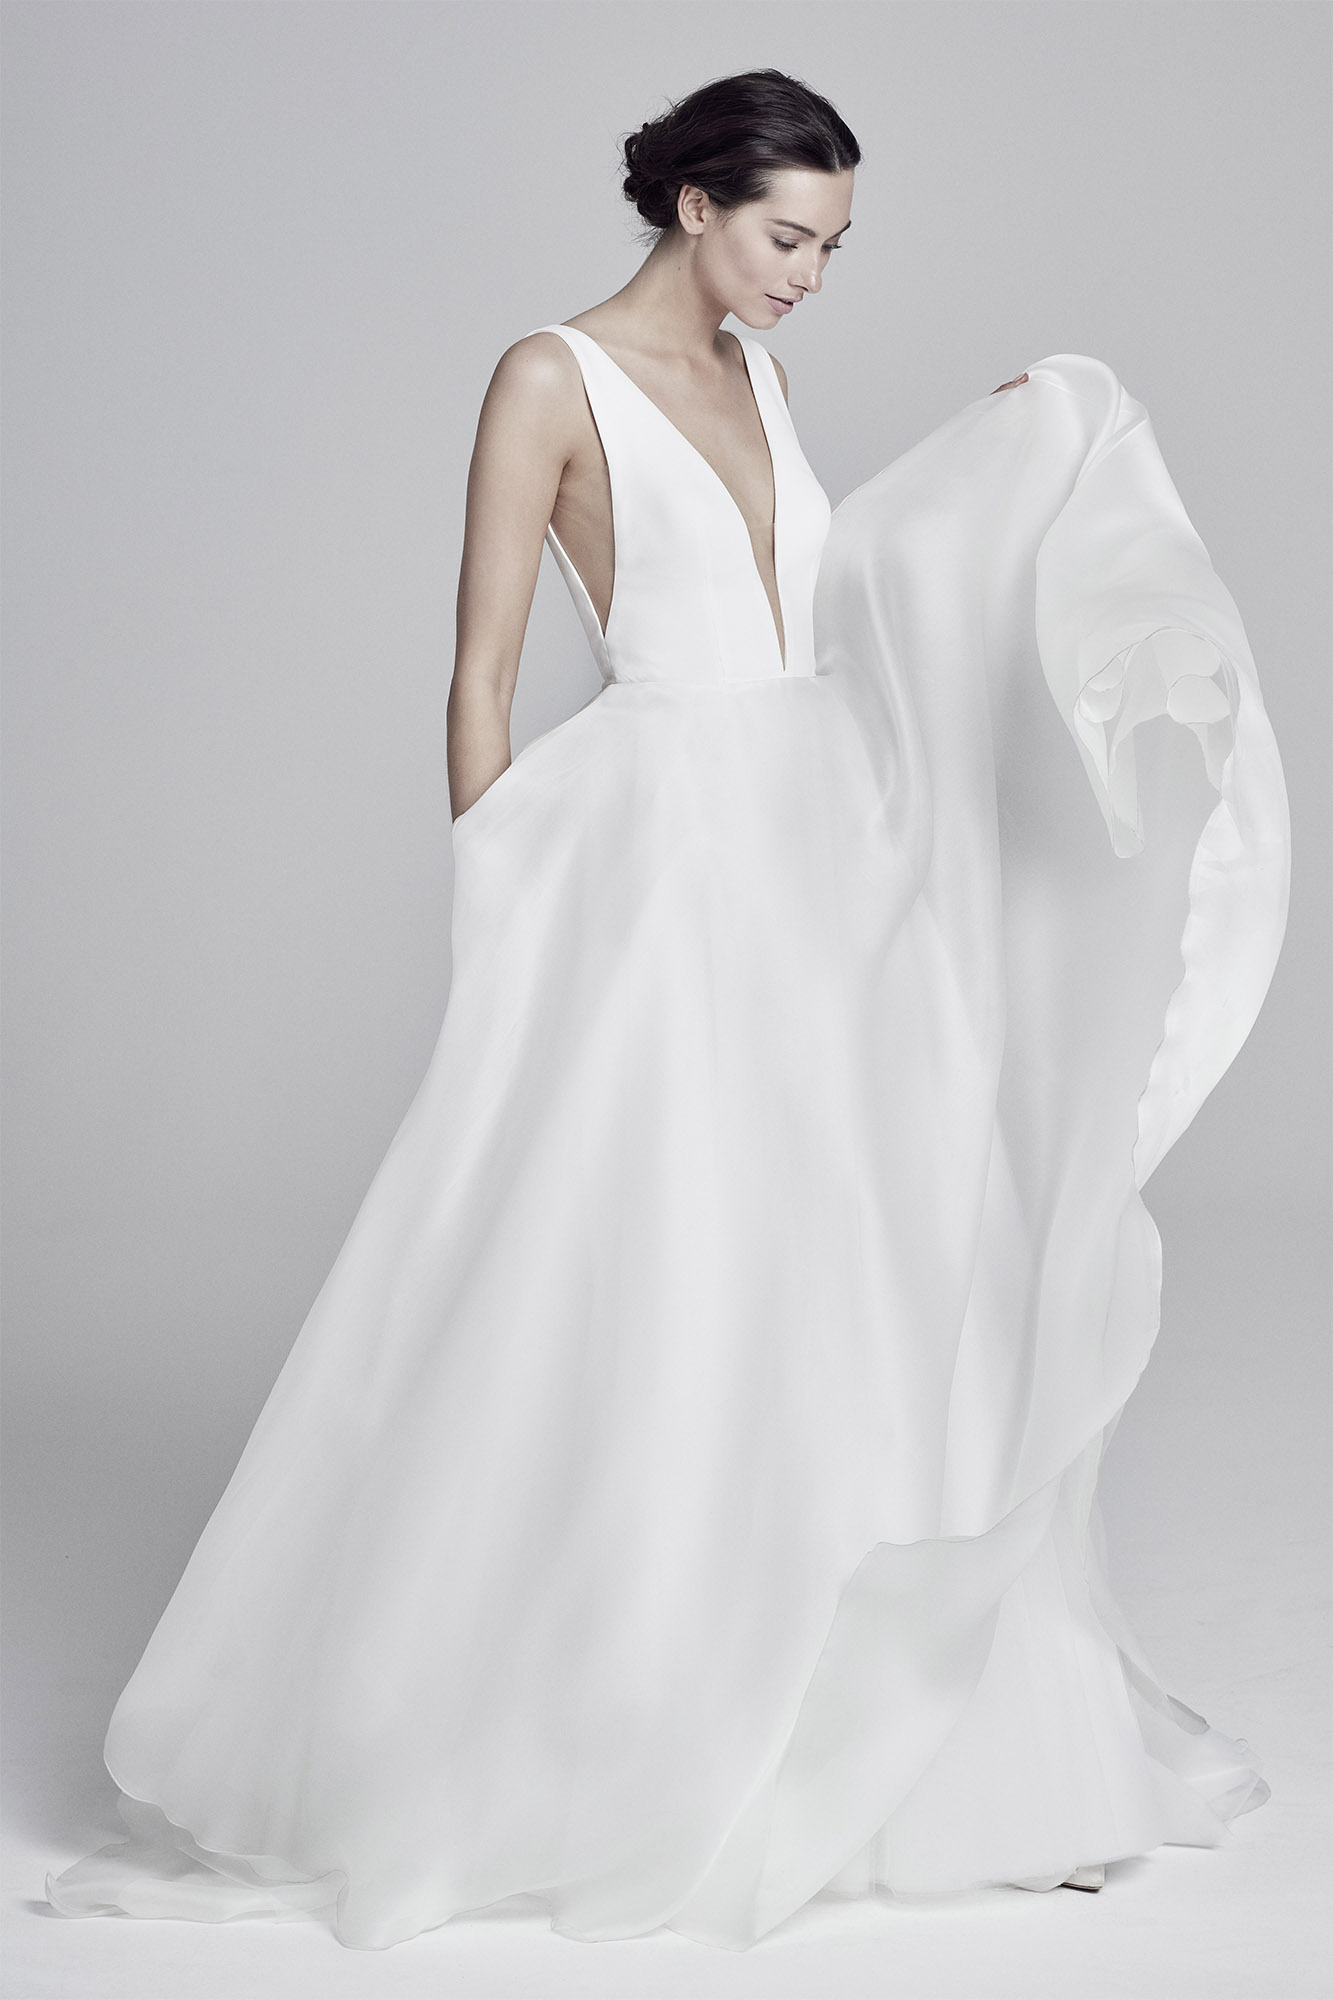 Serrano Collections 2019 Lookbook Designer Wedding Dresses